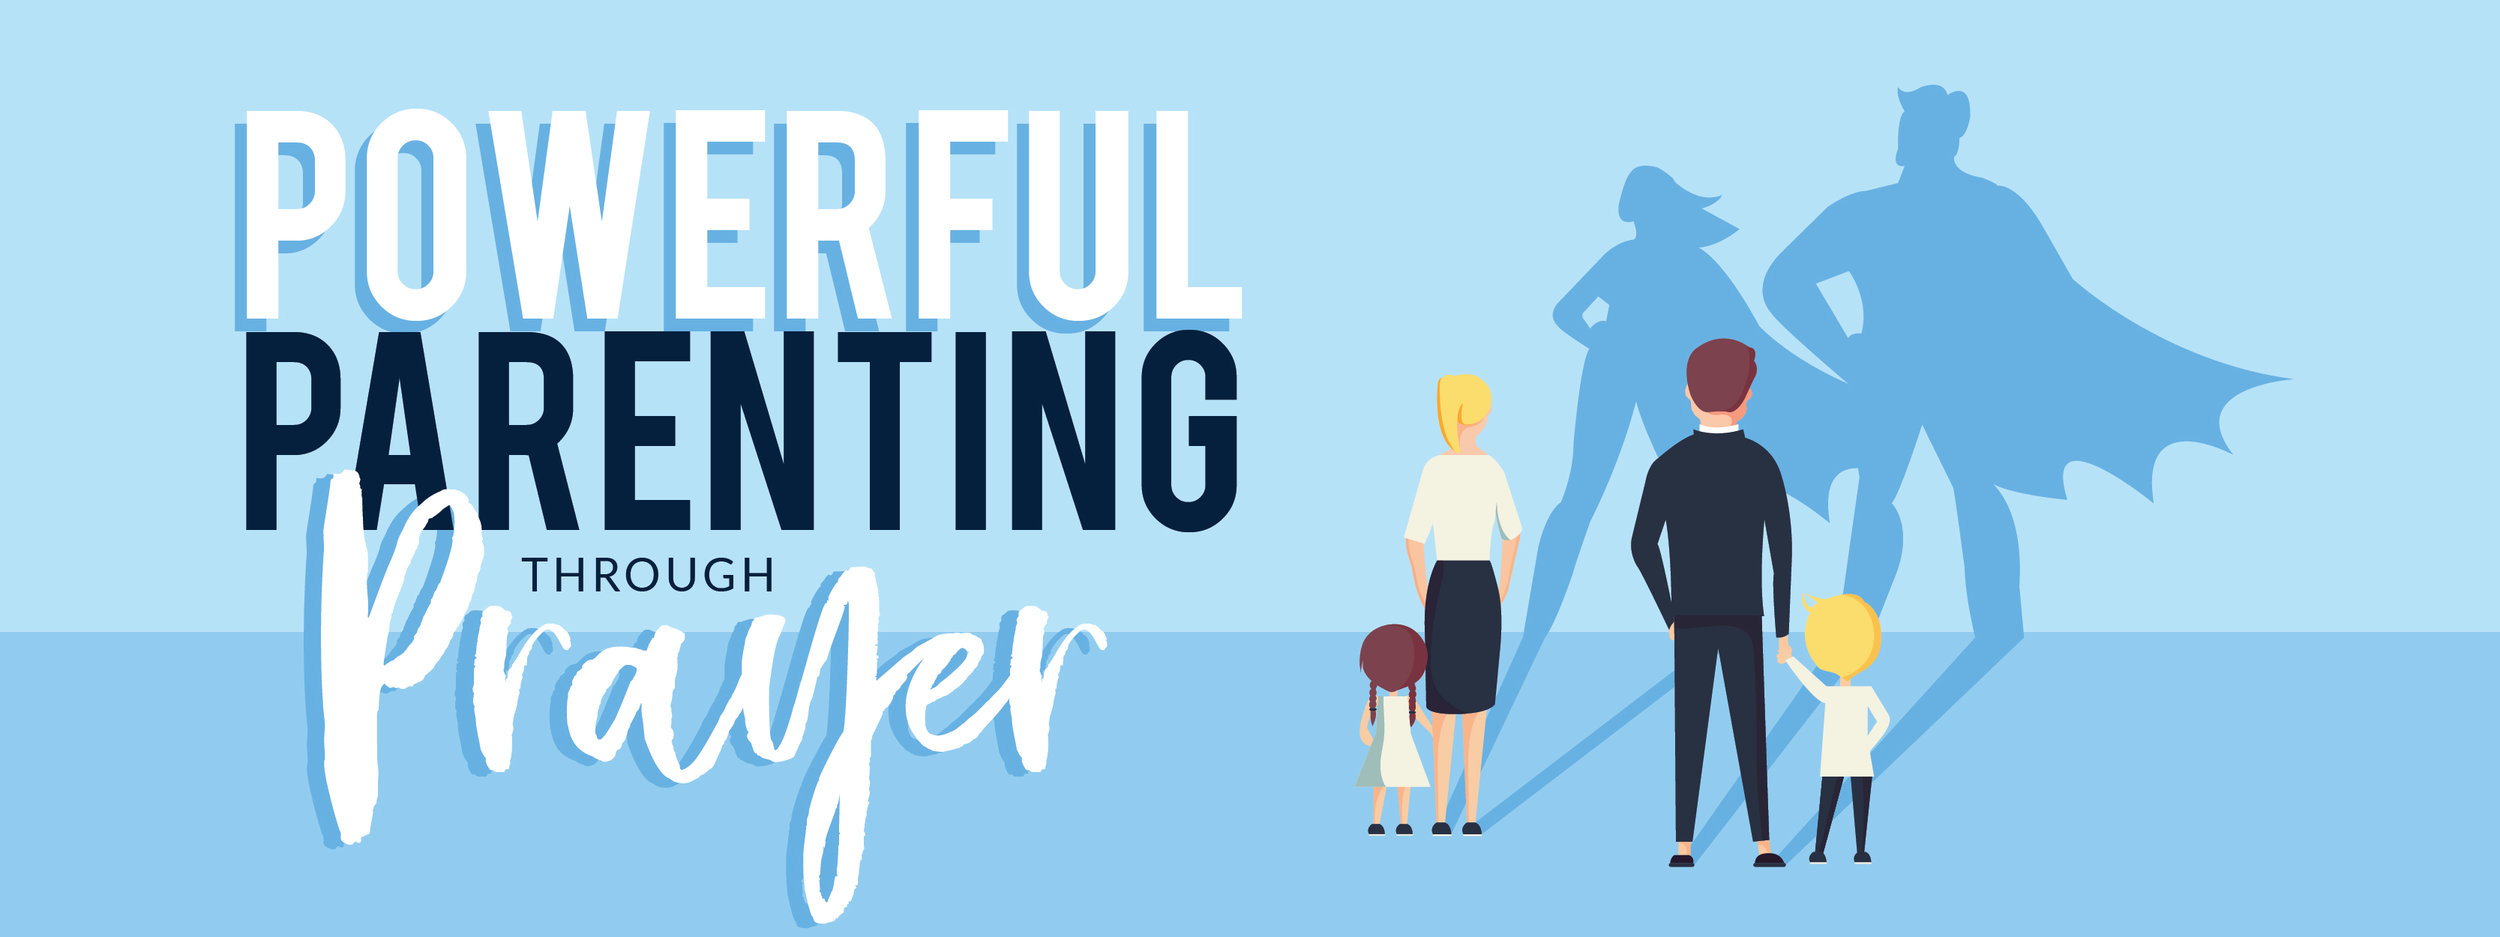 Powerful Parenting Through Prayer - header-01.jpg